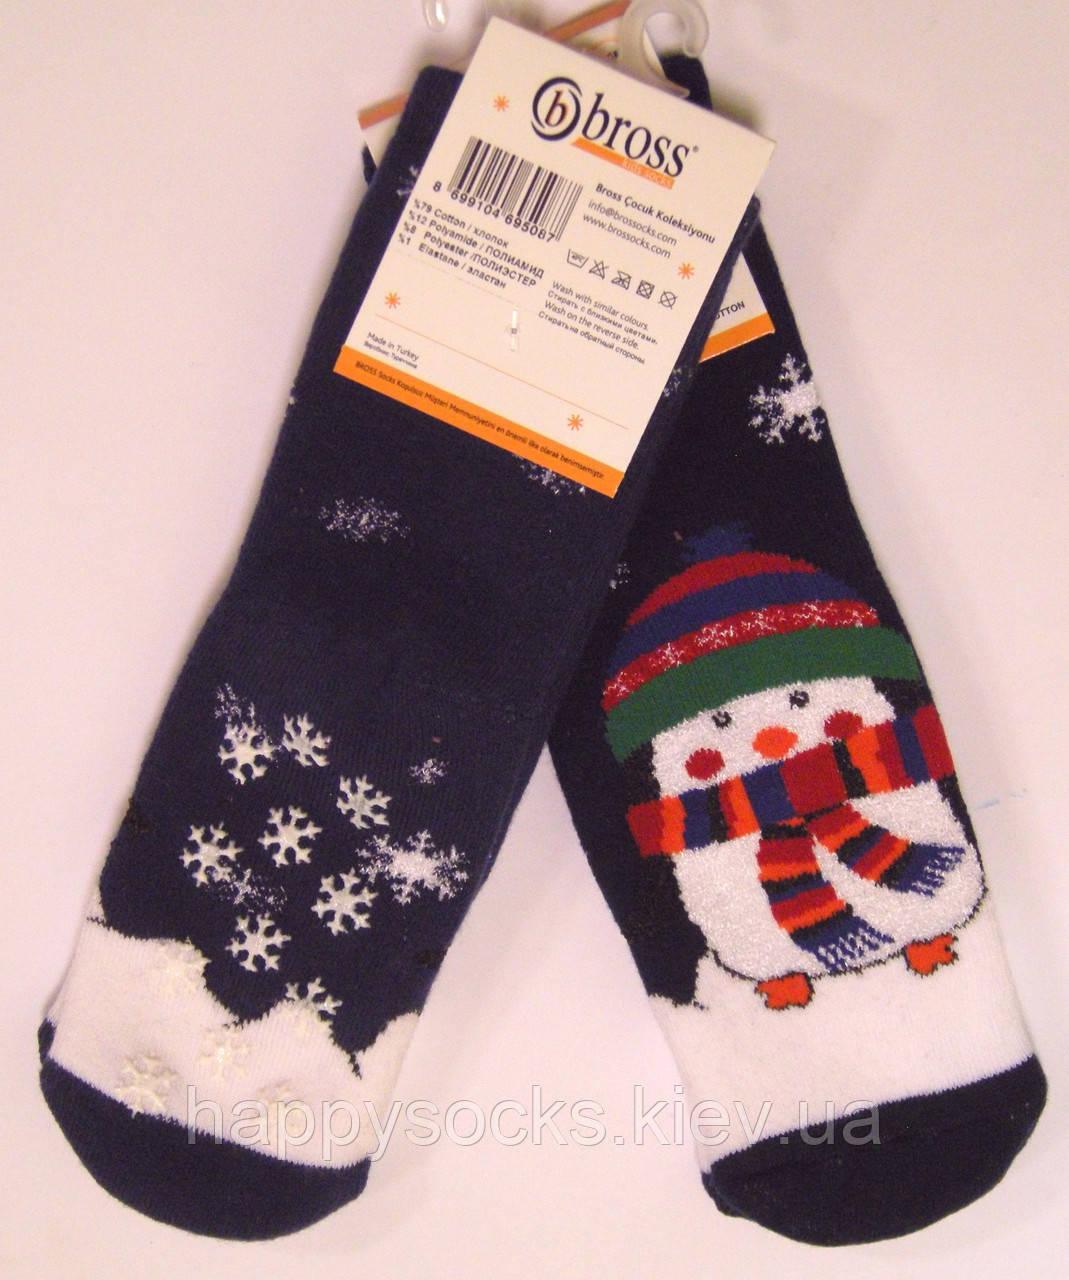 Махровые носки со стопперами детские снеговик